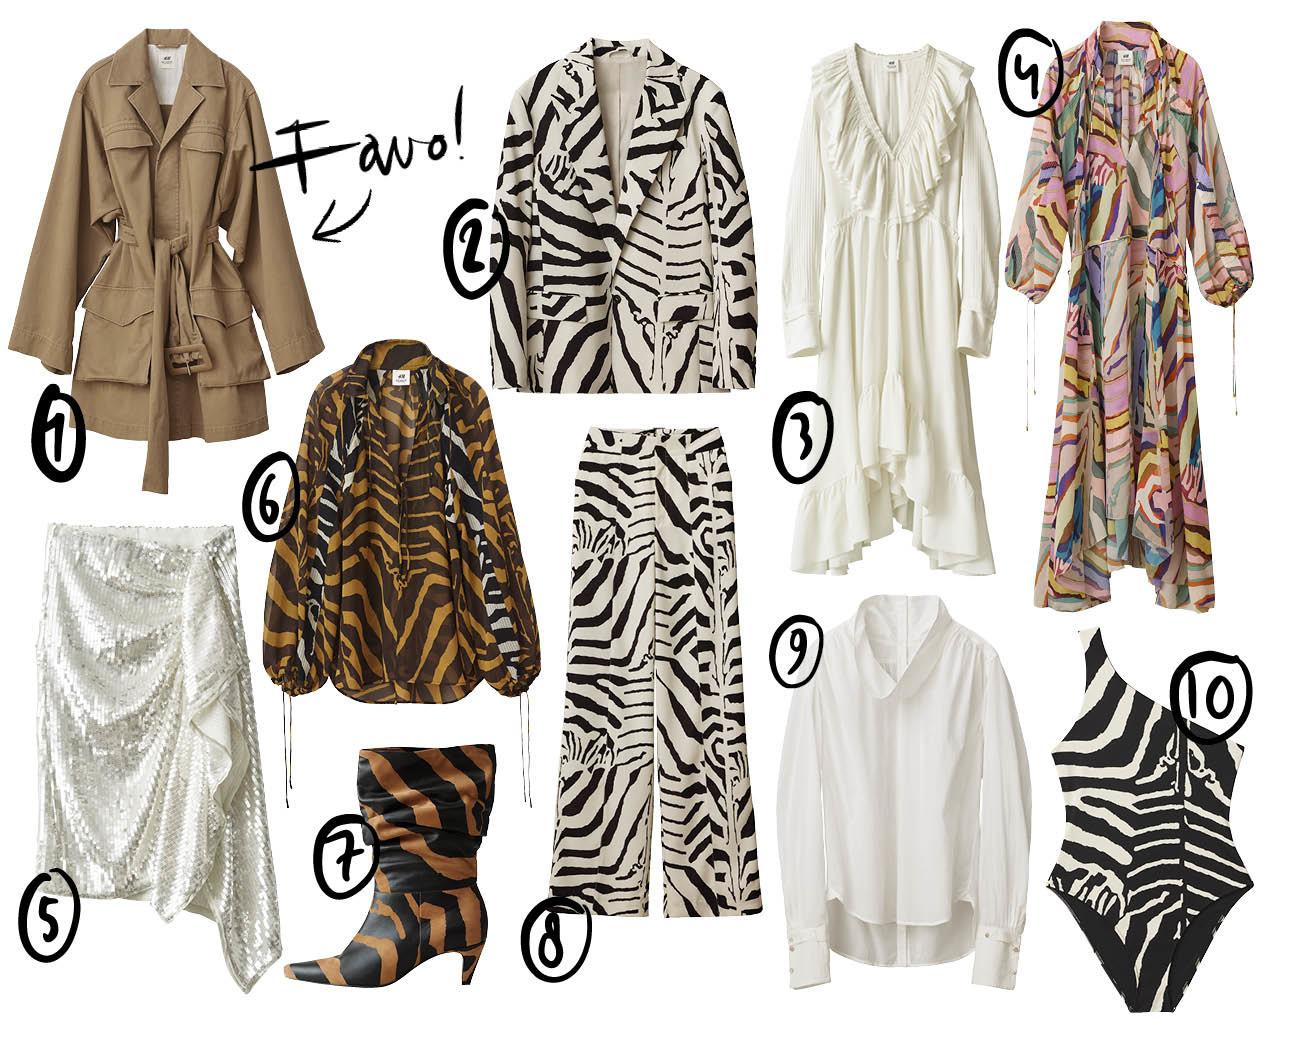 H&M studio collectie nieuwste items shopping